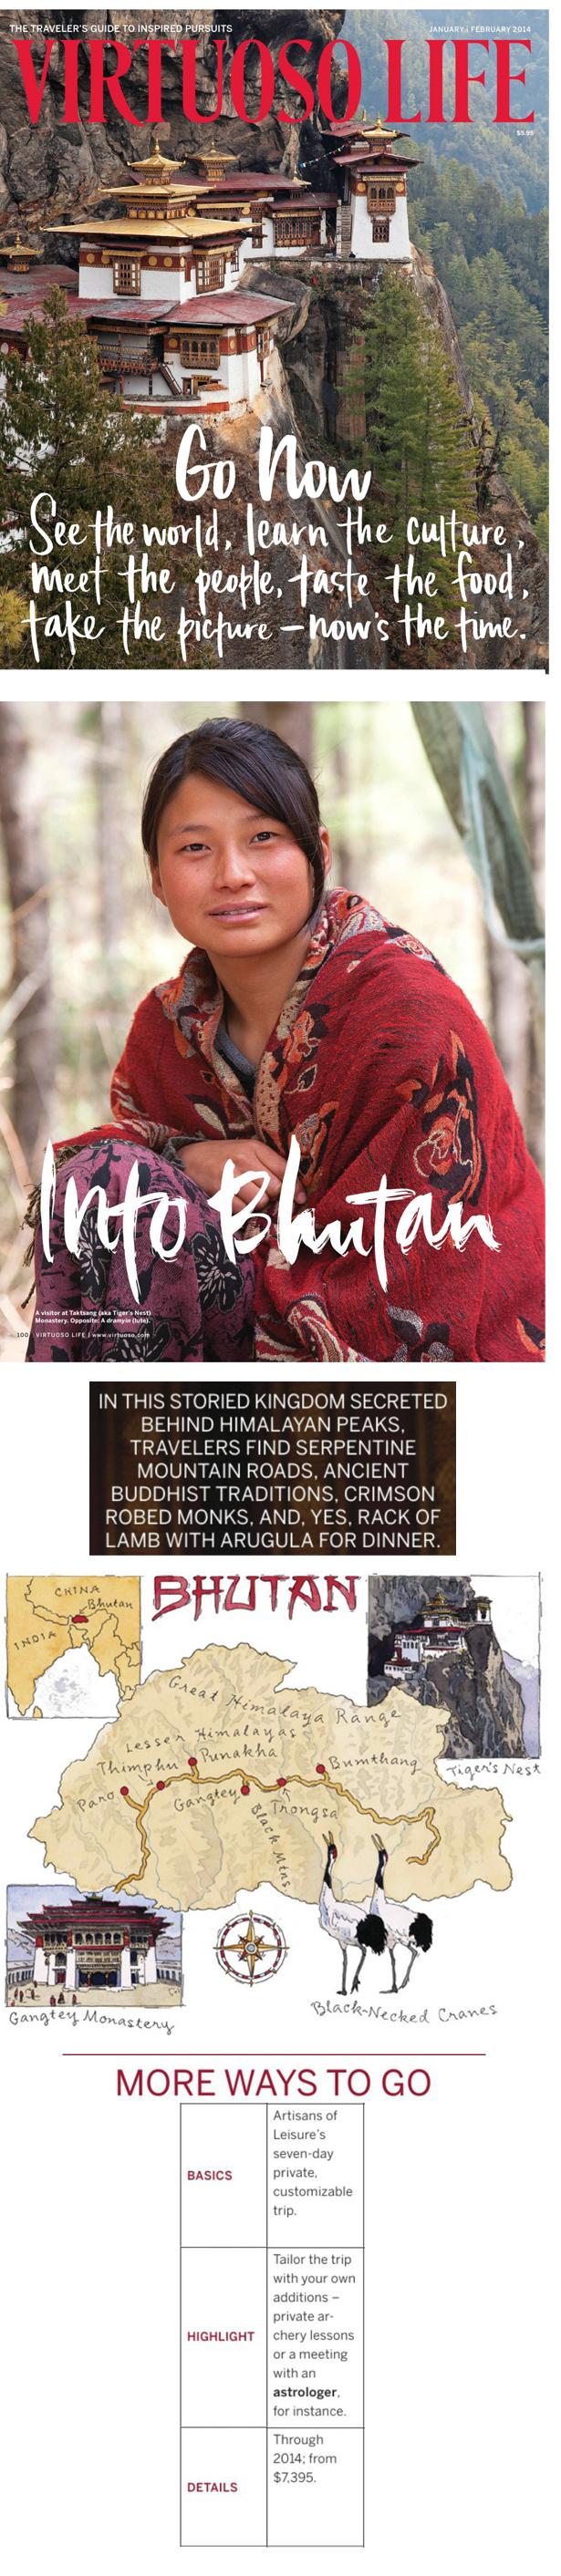 Virtuoso_Life_Bhutan_2014